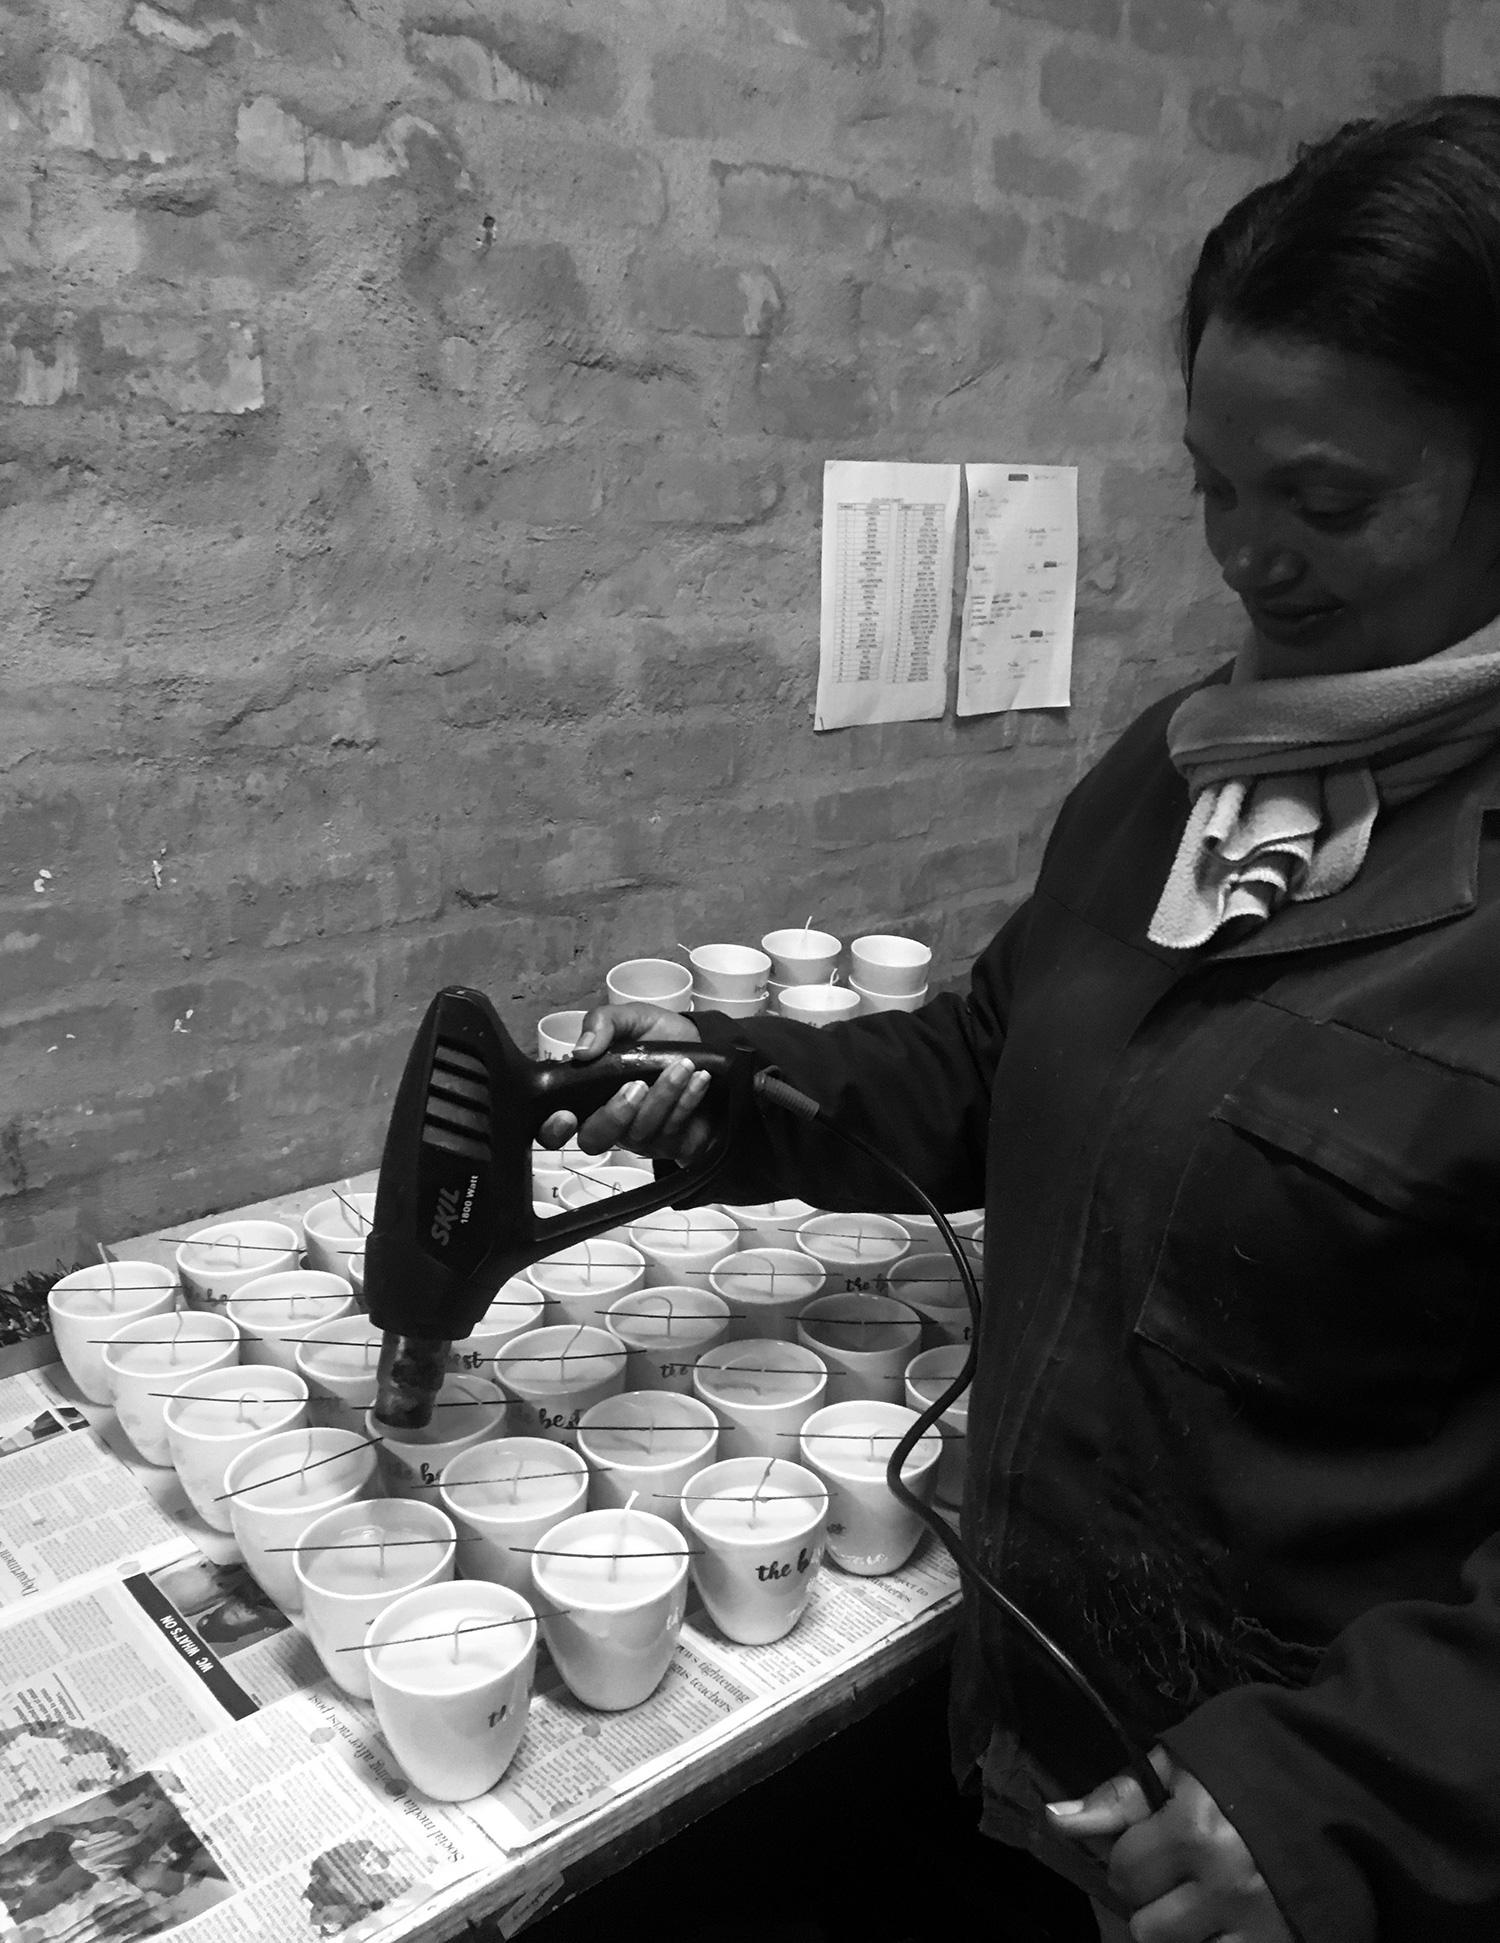 kapula-handmade-filled-ceramic-candles-drying-wax-process.jpg